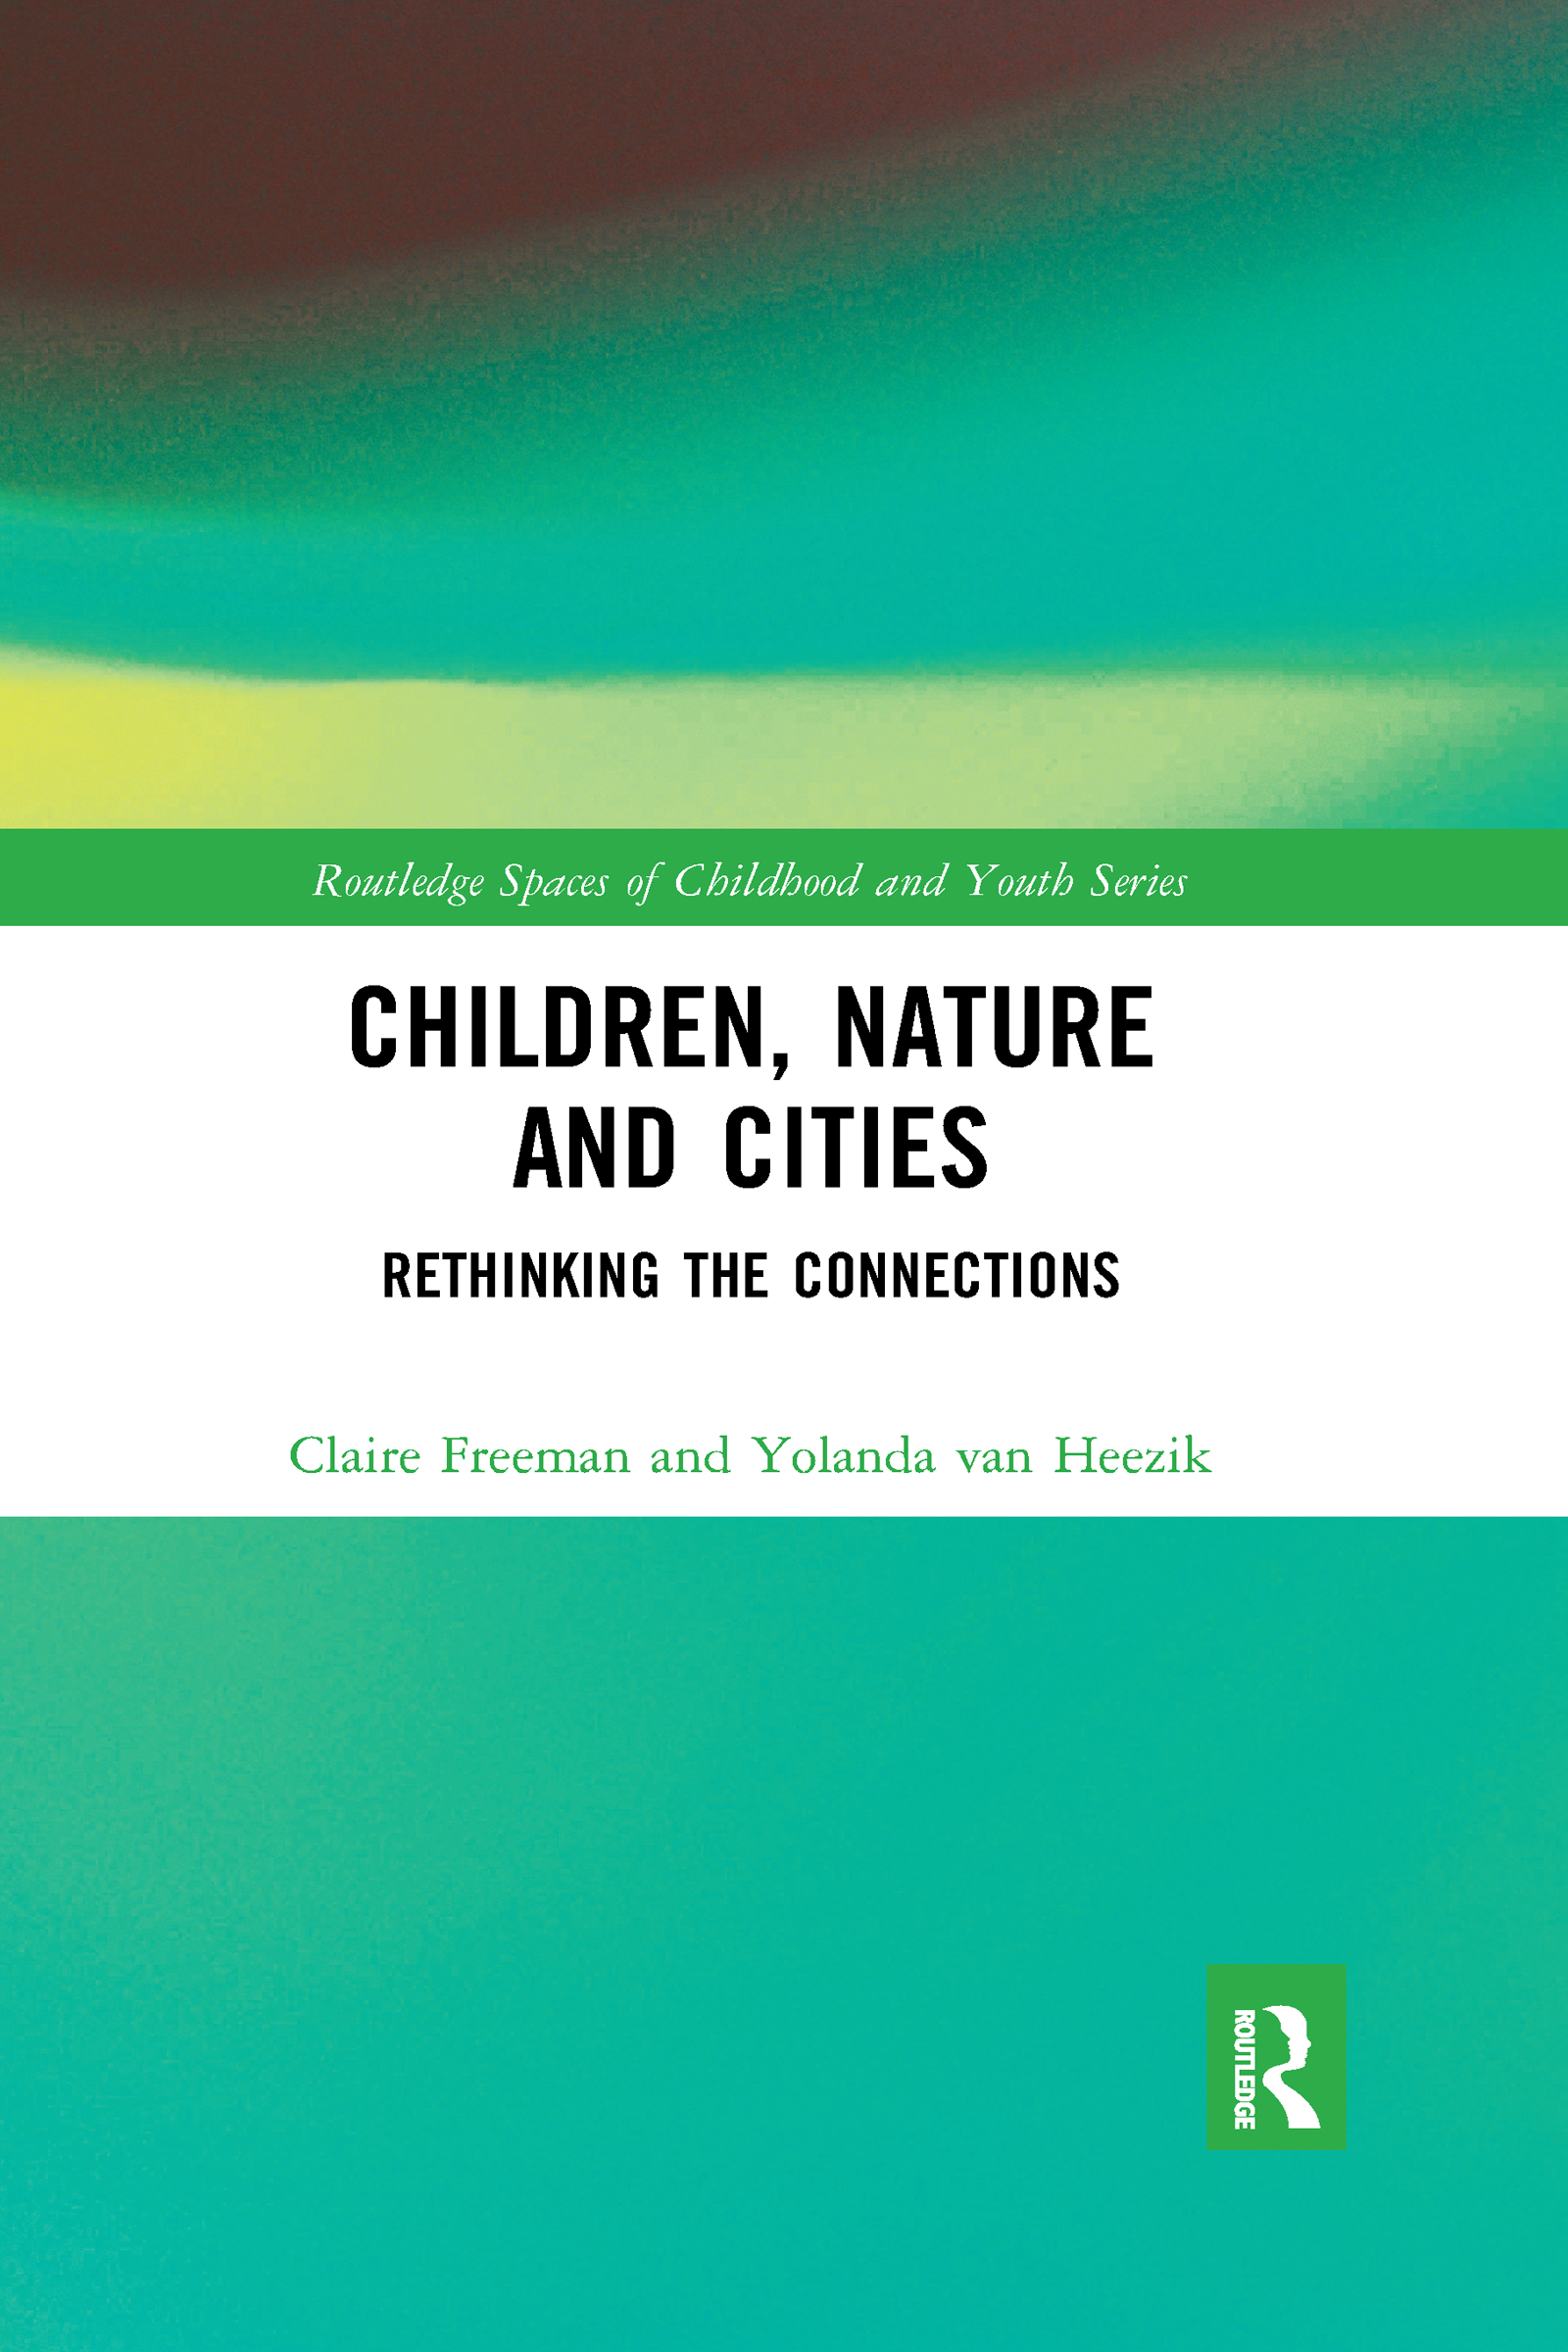 Children, Nature and Cities